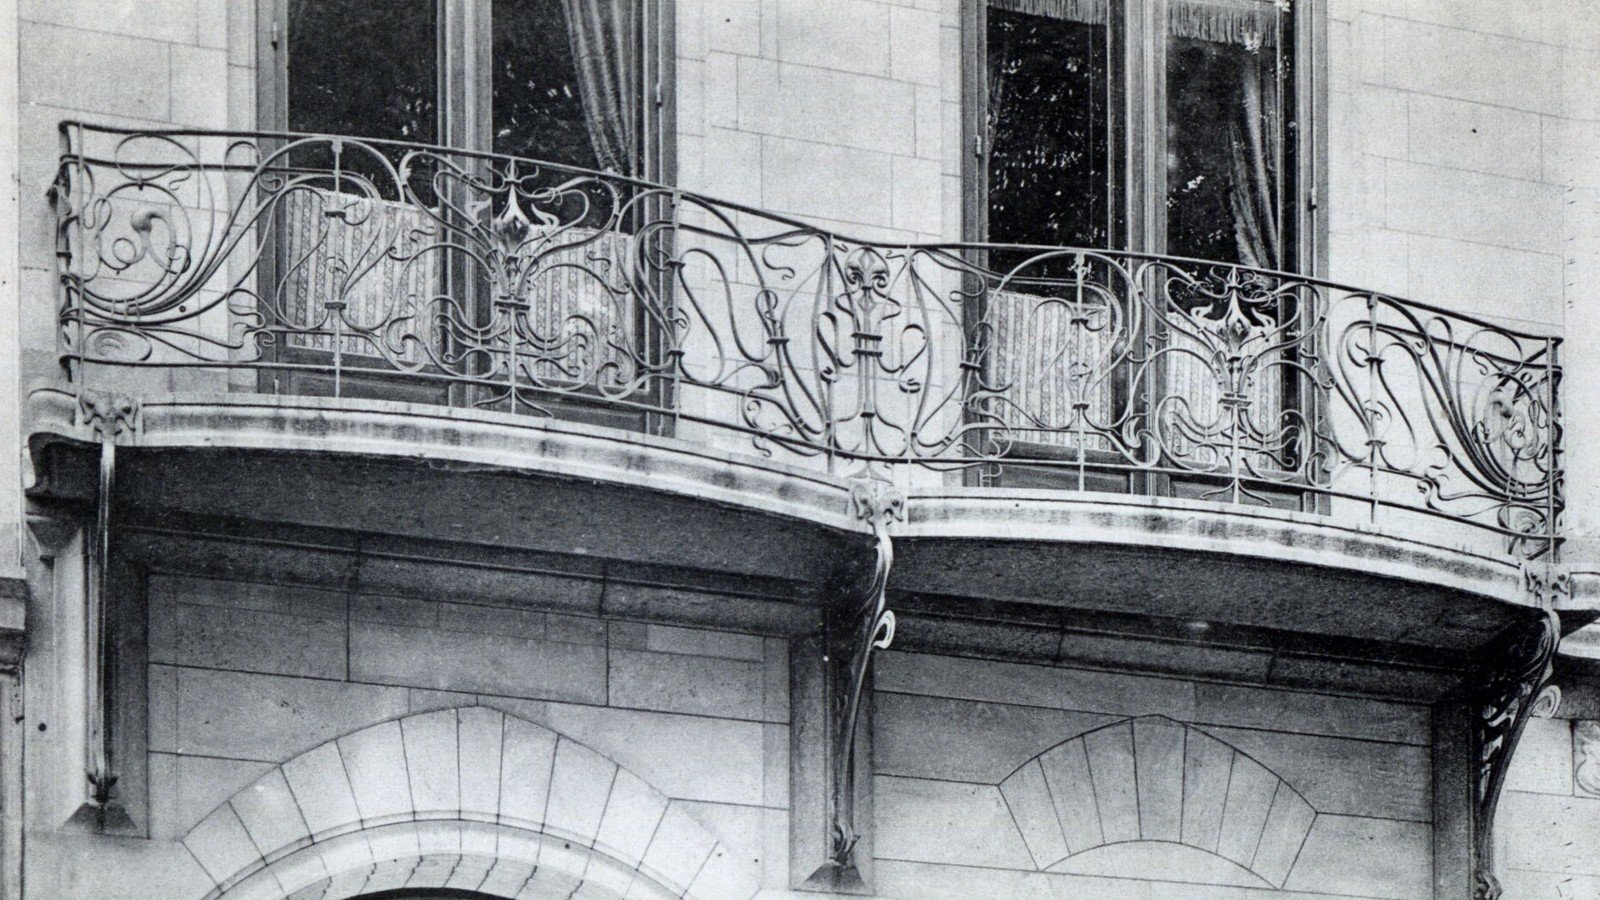 Bruxelles maison (detail), 21 av. Louise-architecte: Saintenoy, Ghent University Library, CC BY-SA